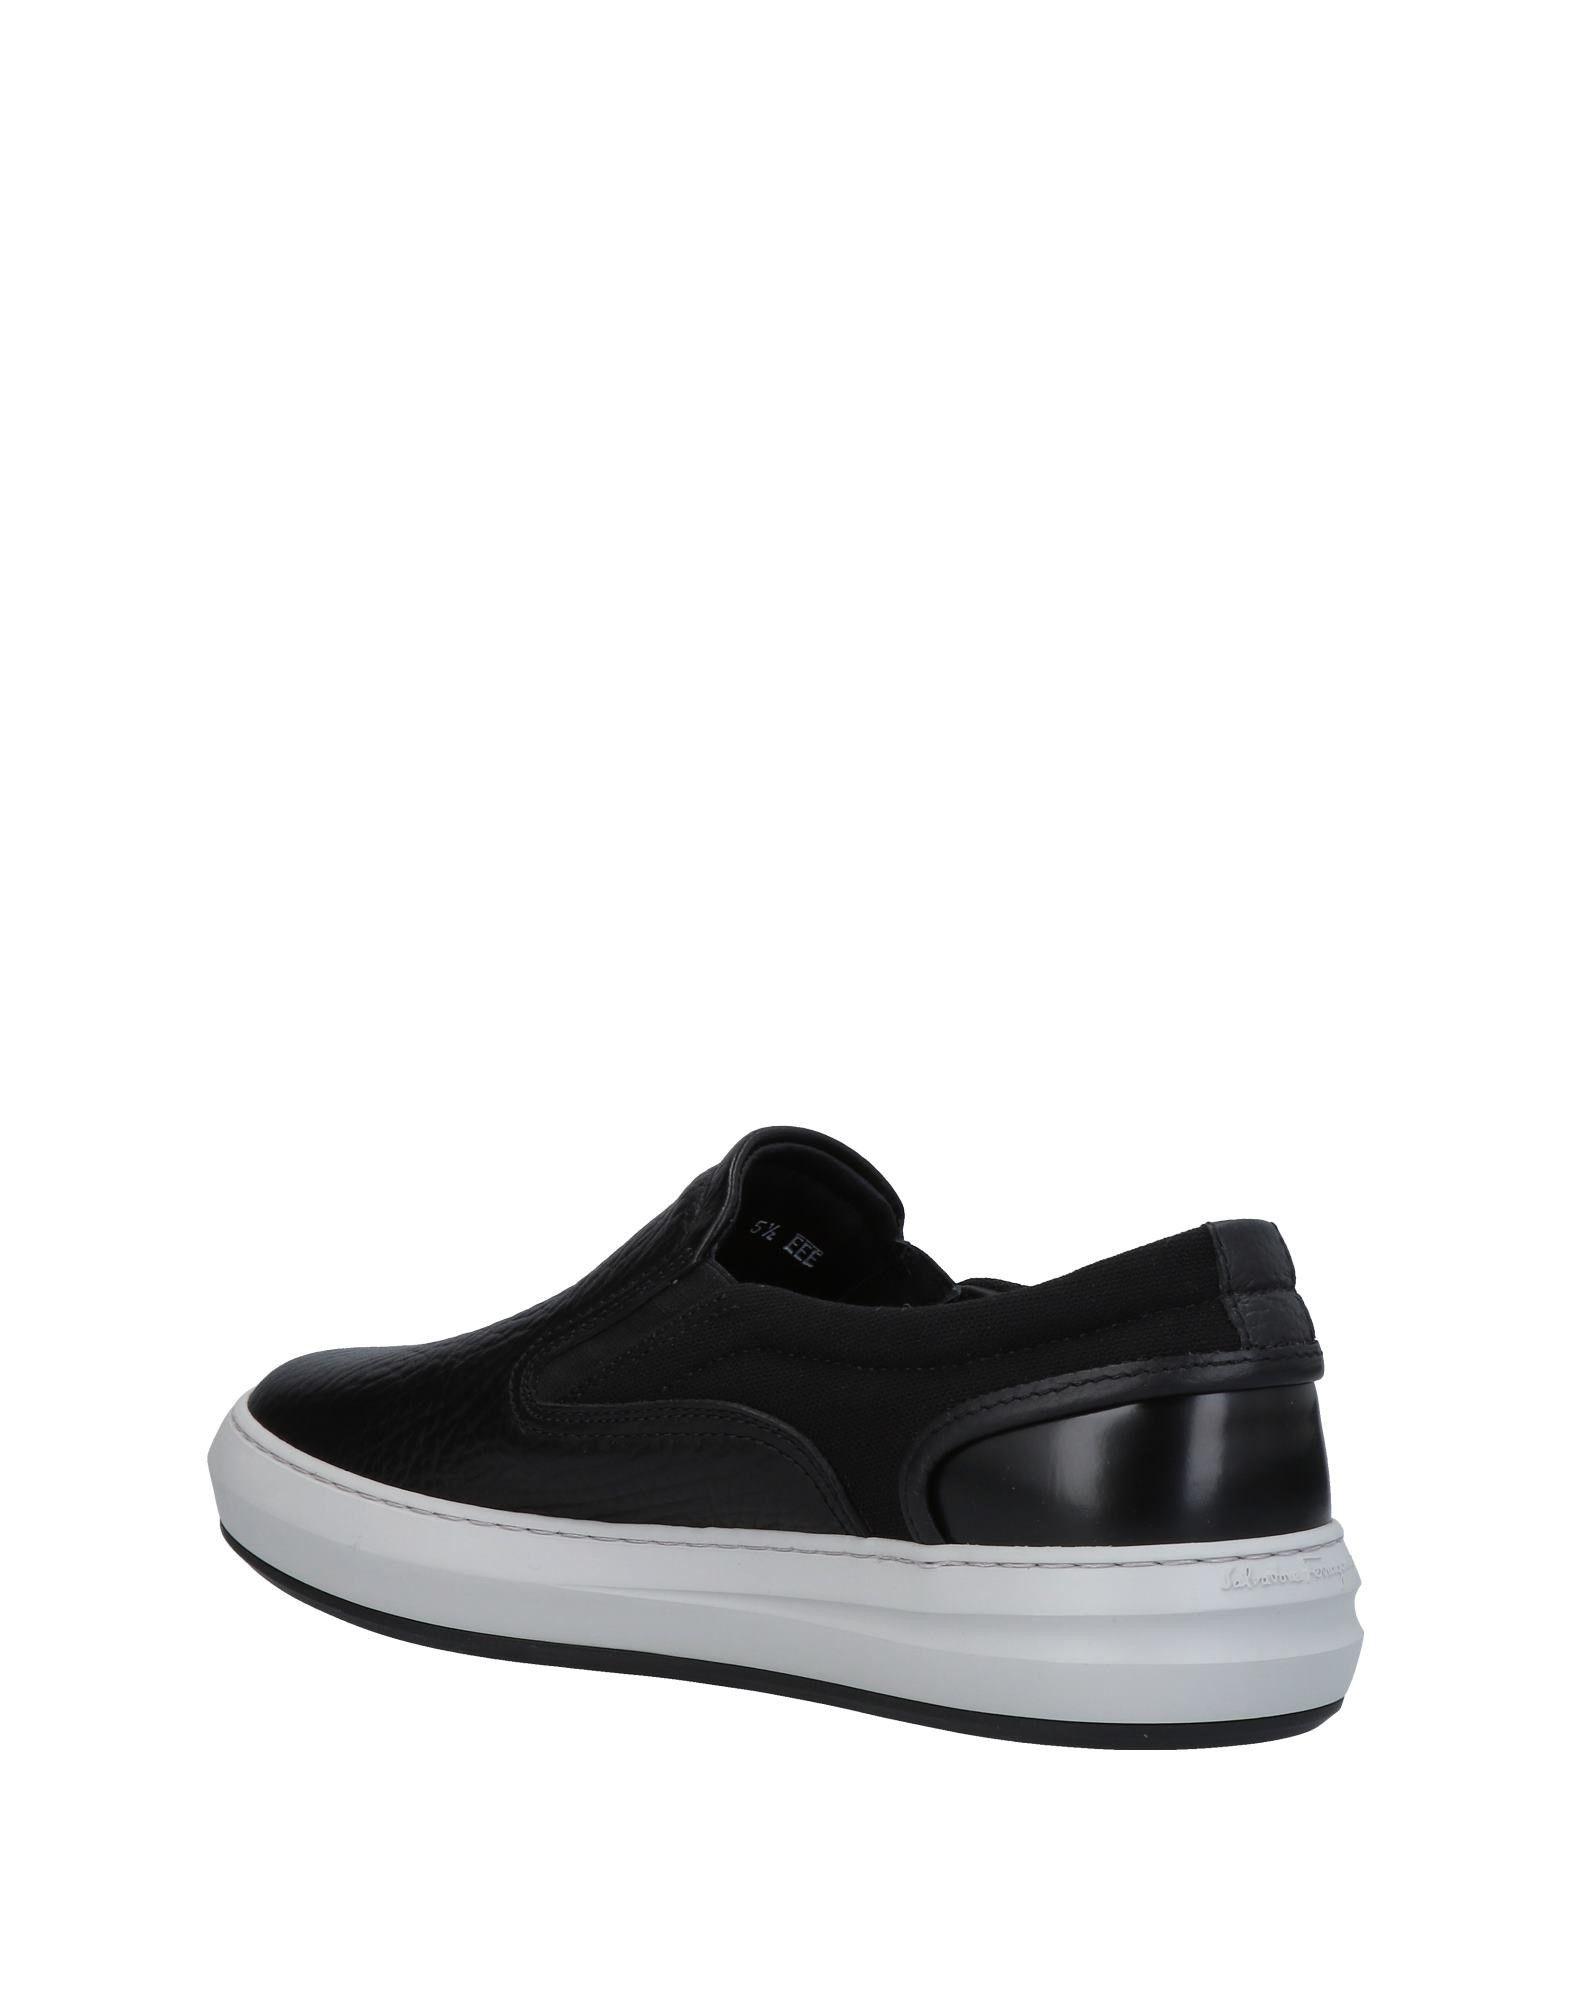 Salvatore Ferragamo Sneakers Herren  Schuhe 11430347QT Gute Qualität beliebte Schuhe  586ff9